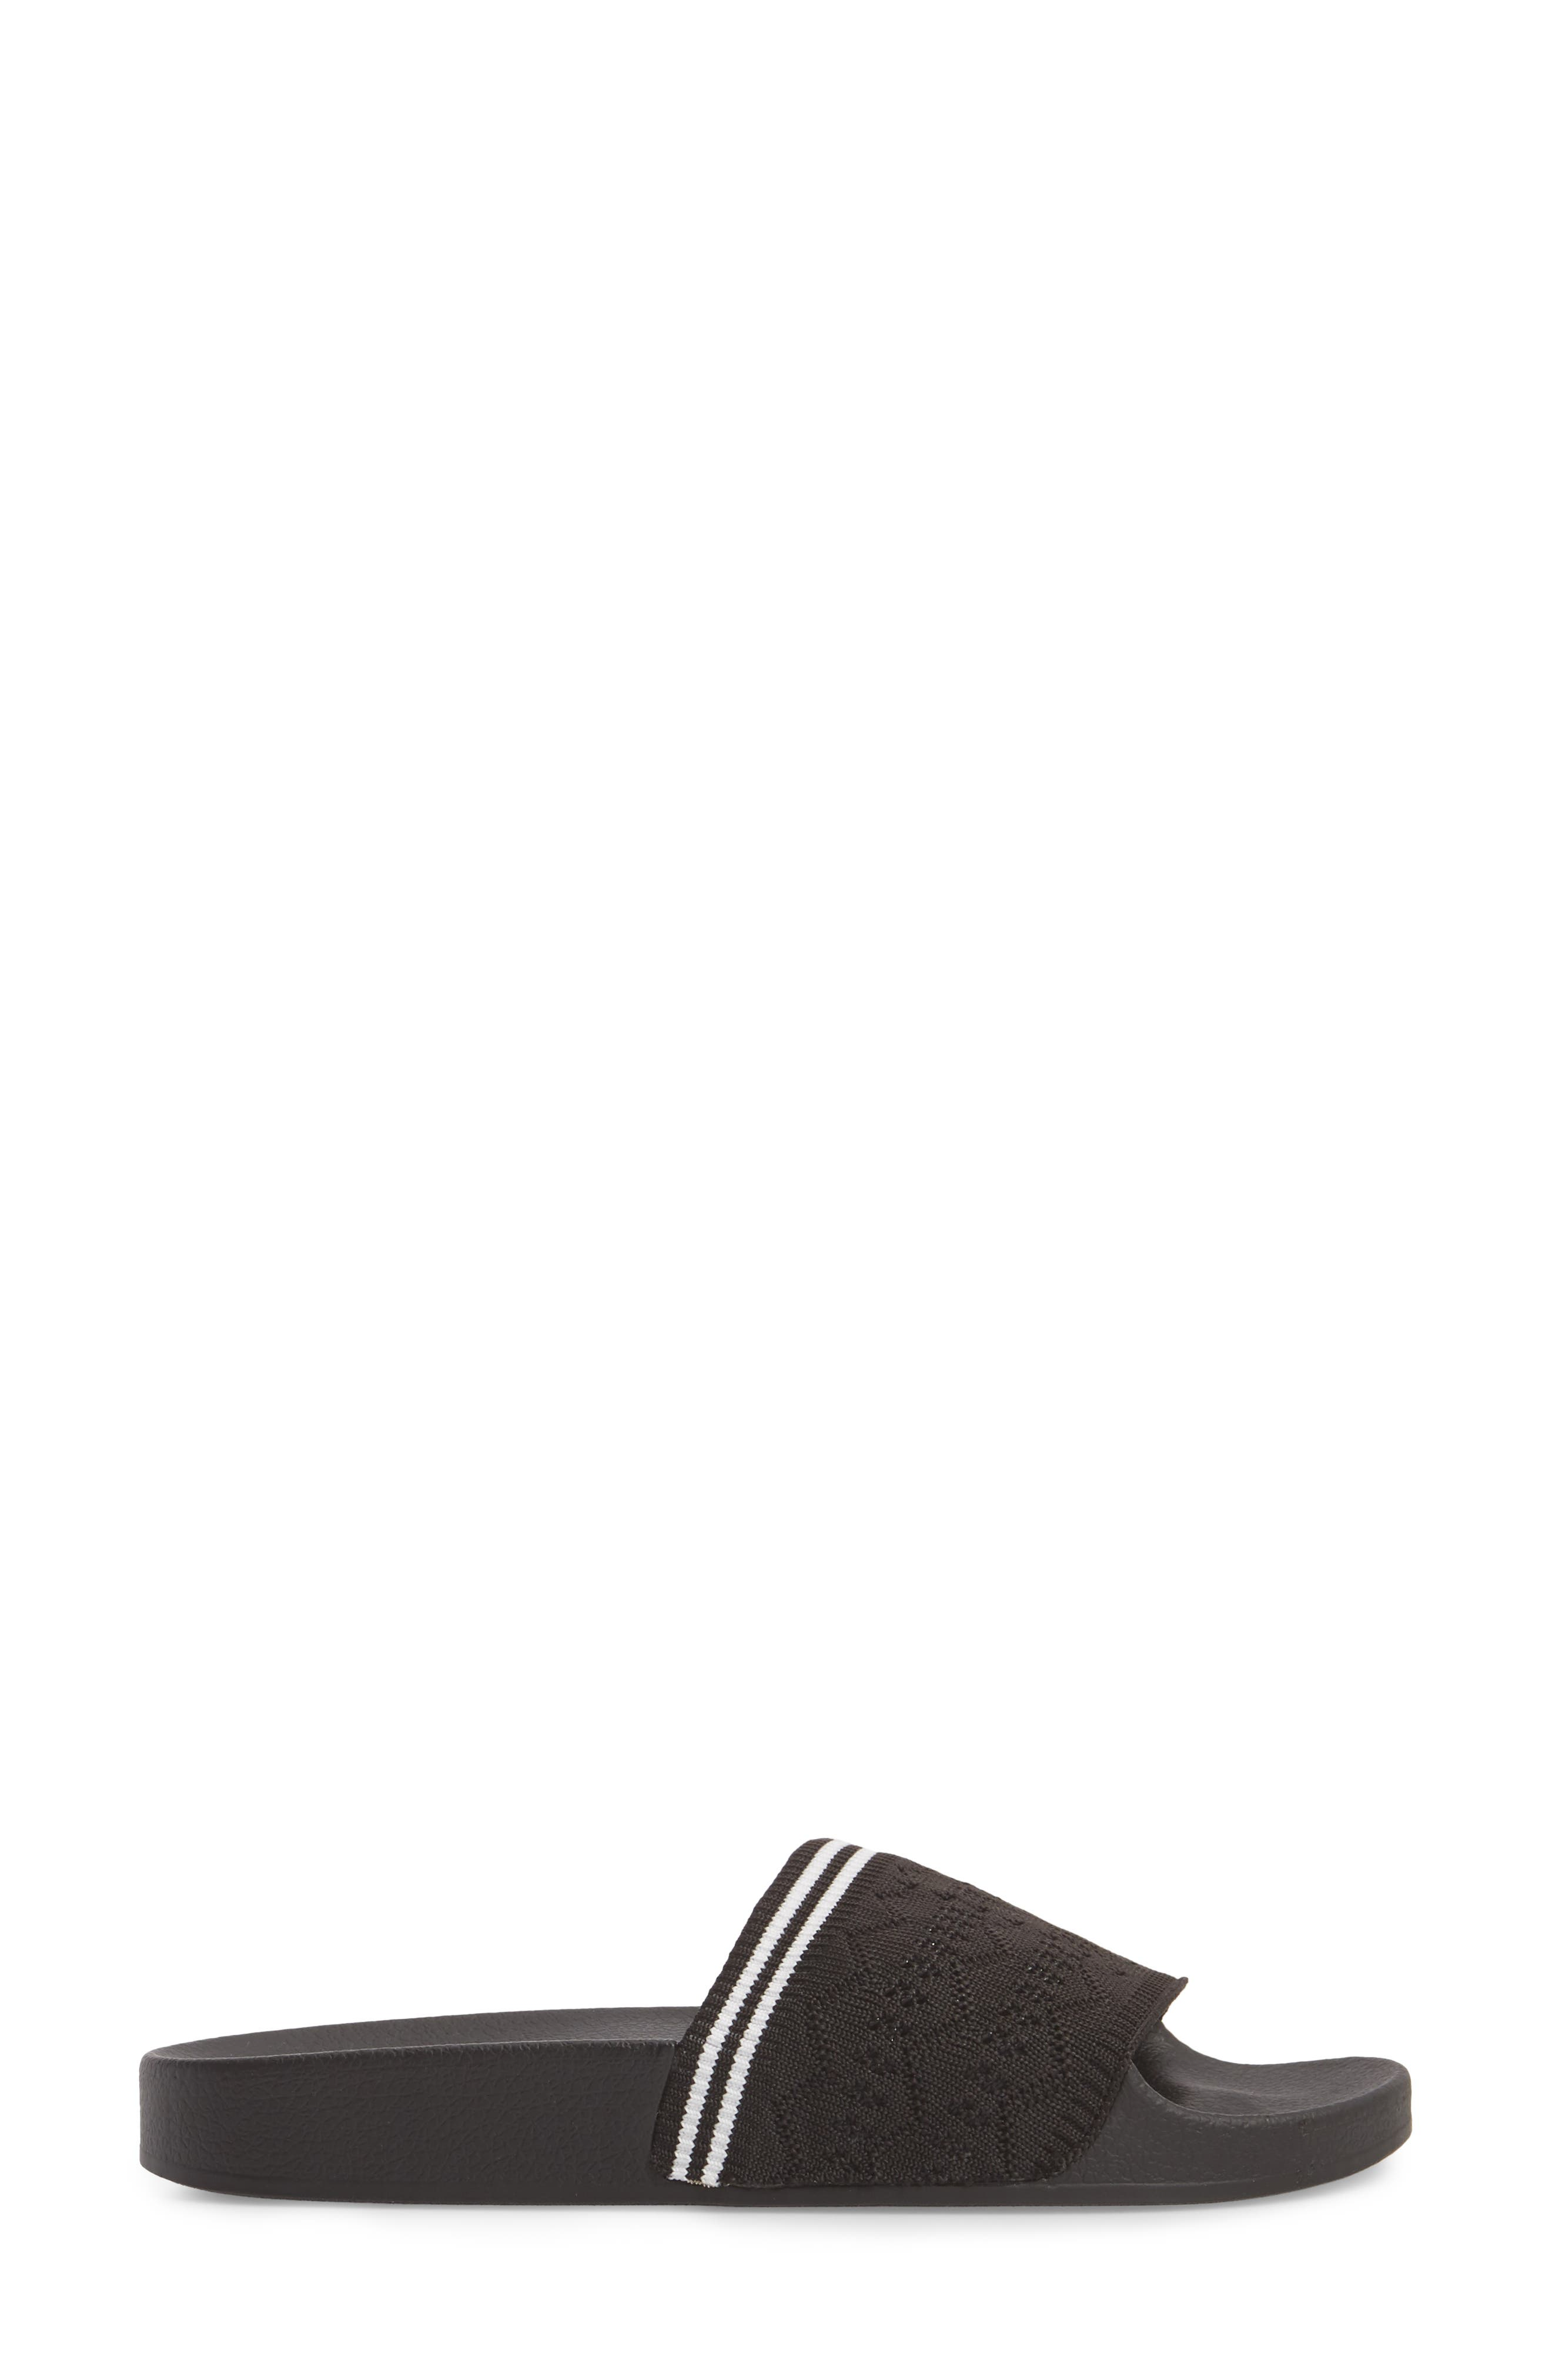 Vibe Sock Knit Slide Sandal,                             Alternate thumbnail 3, color,                             001